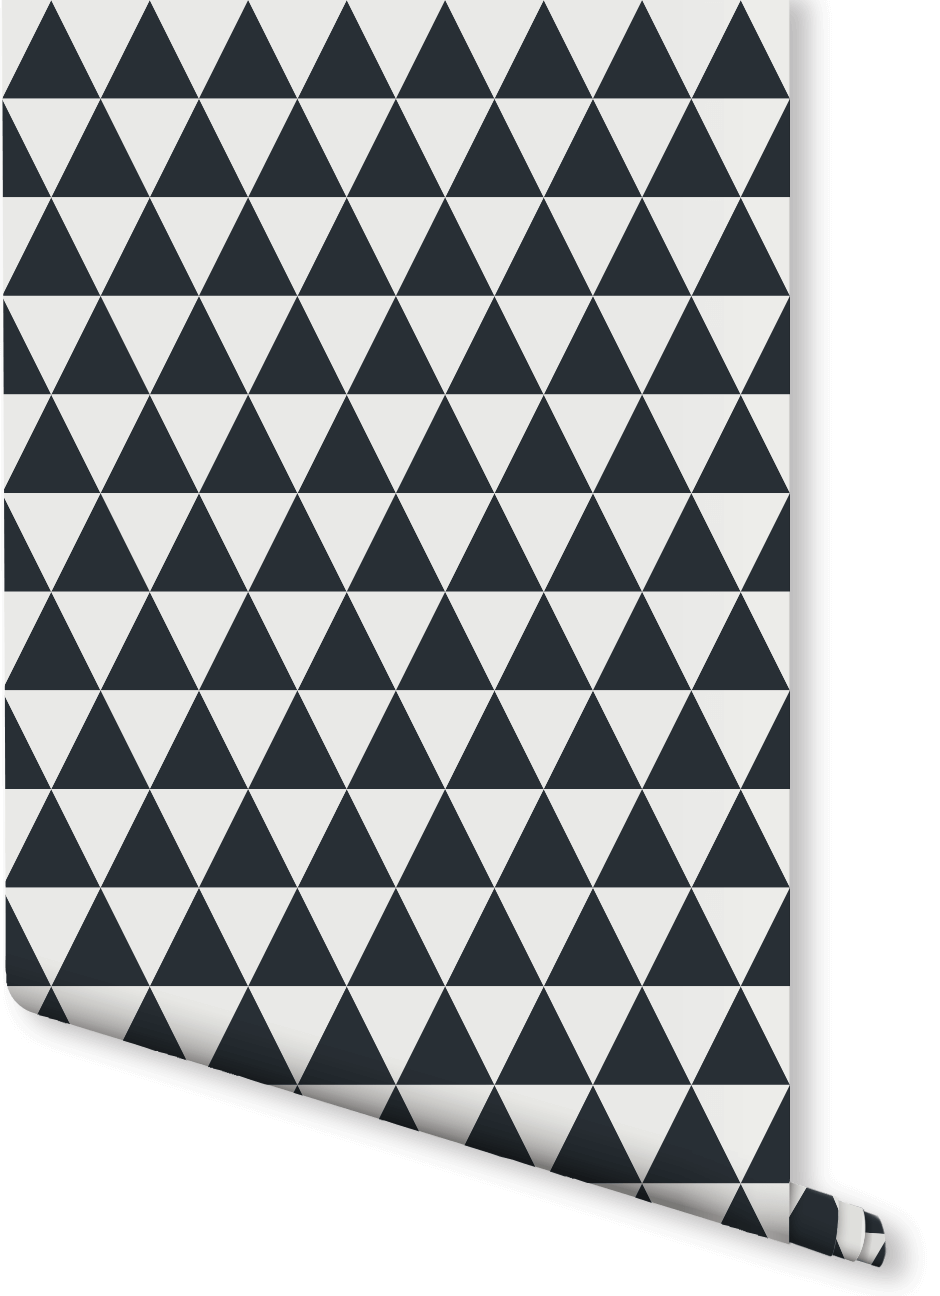 Small Triangle Print Wallpaper Milexa Print Wallpaper Geometric Wallpaper Design Geometric Pattern Wallpaper